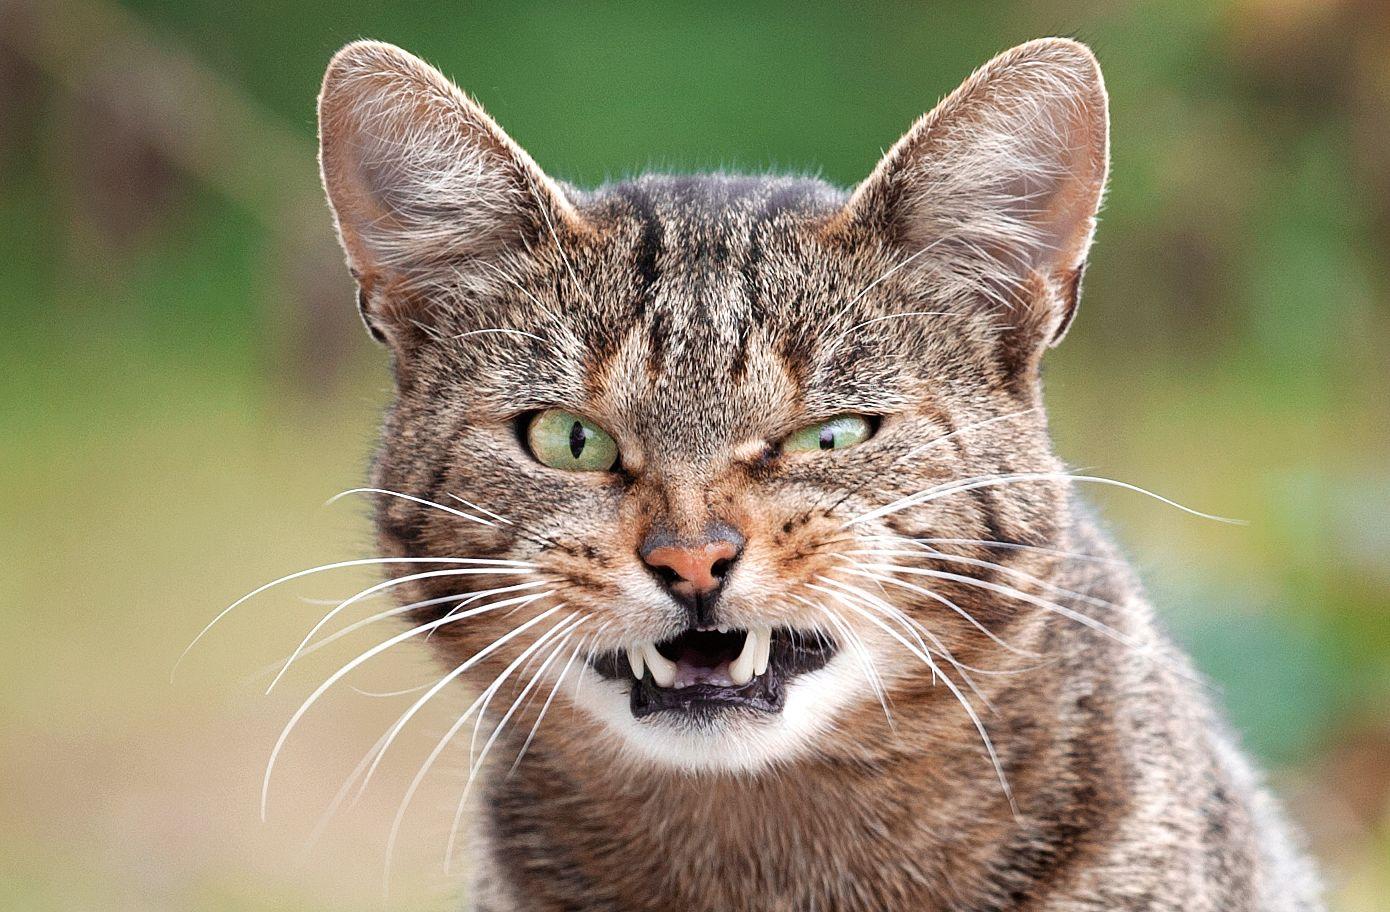 Кот зевает кот котик котики животное анималистика